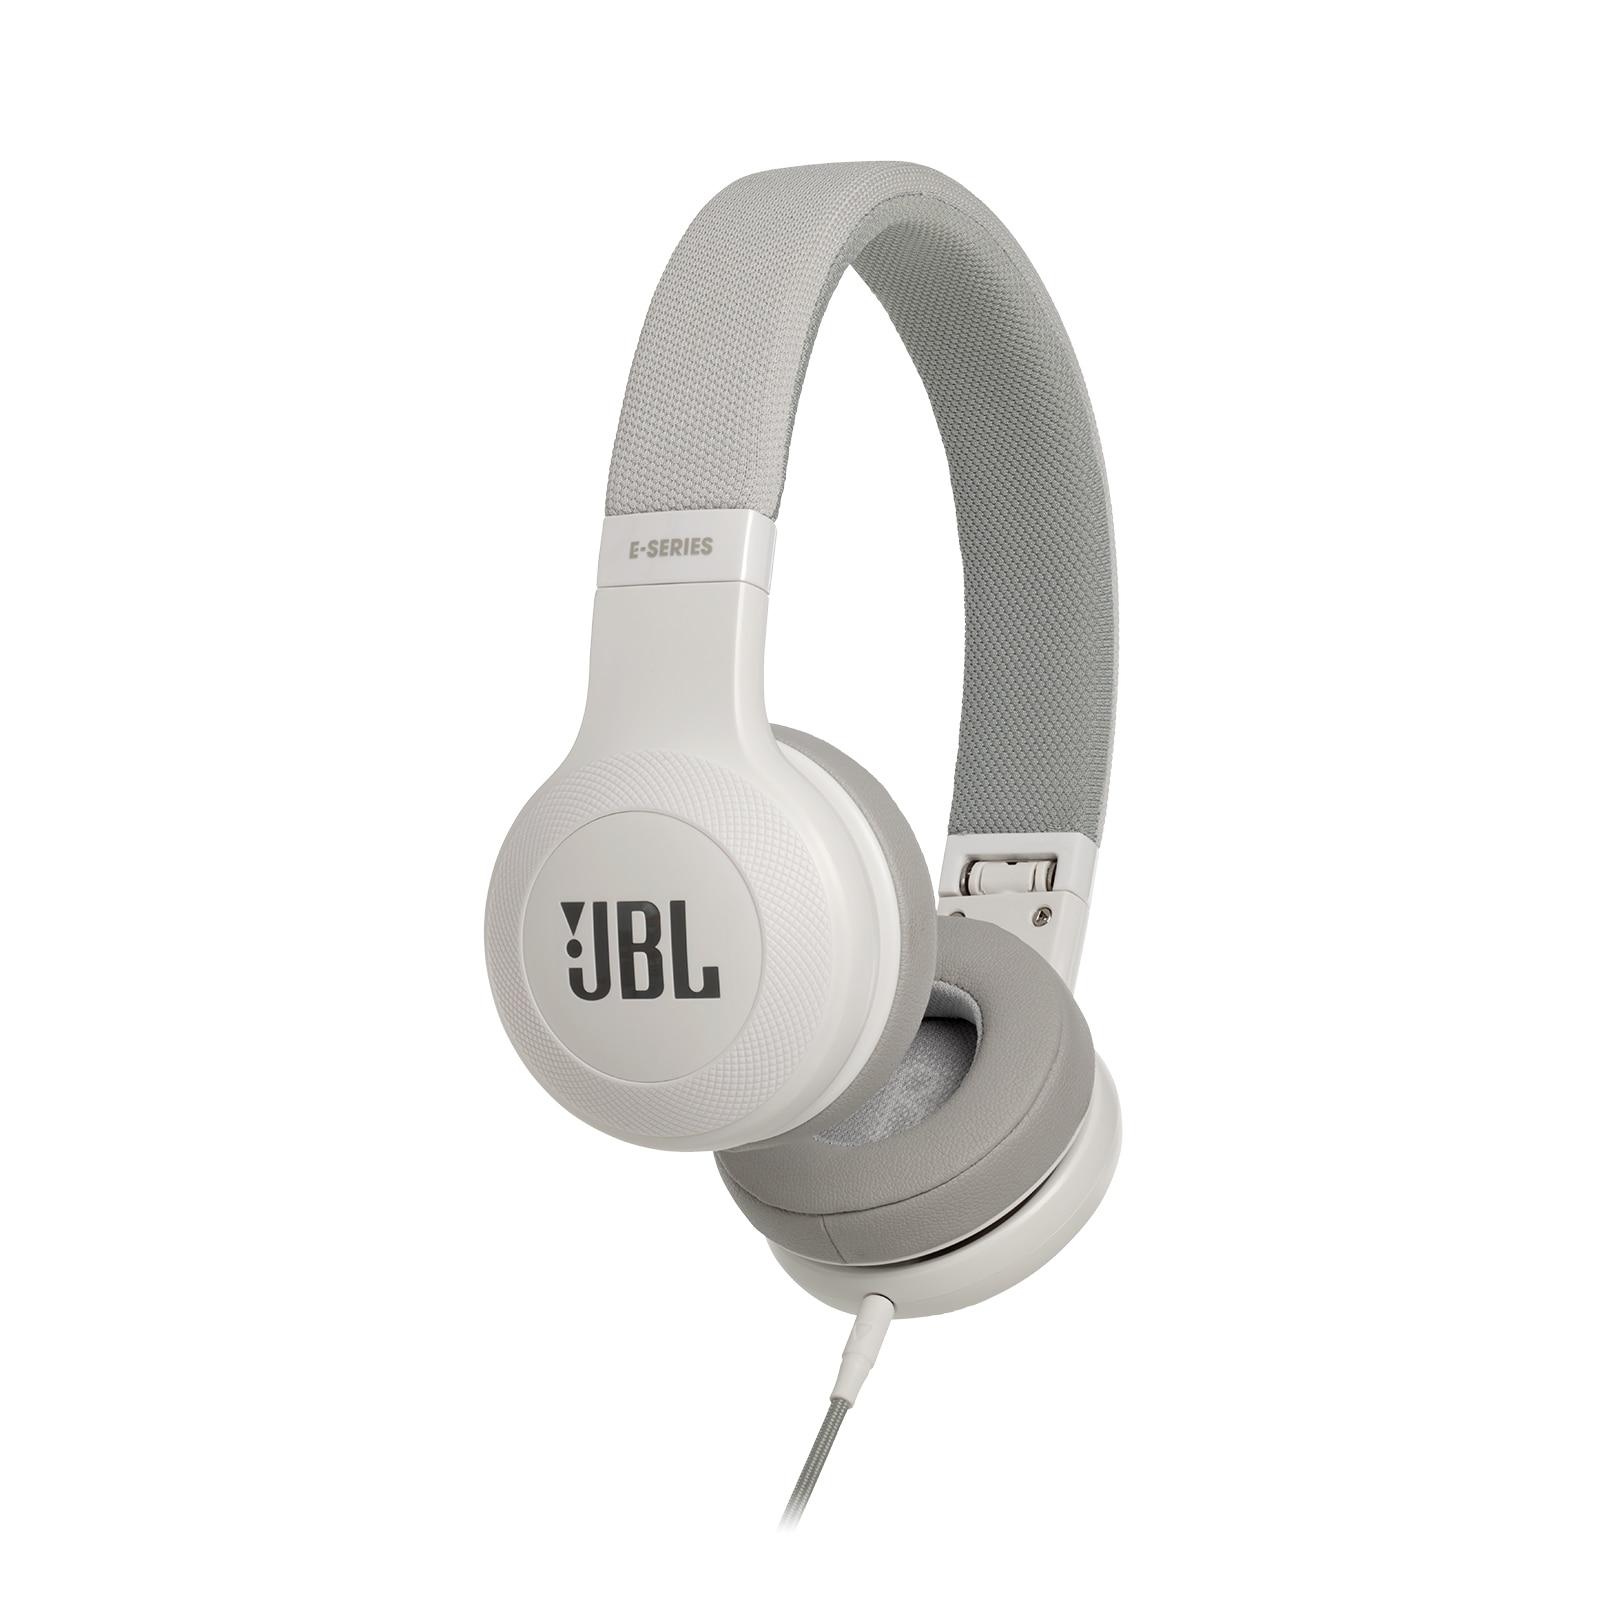 Fotografie Casti audio on-ear cu microfon JBL E35, White